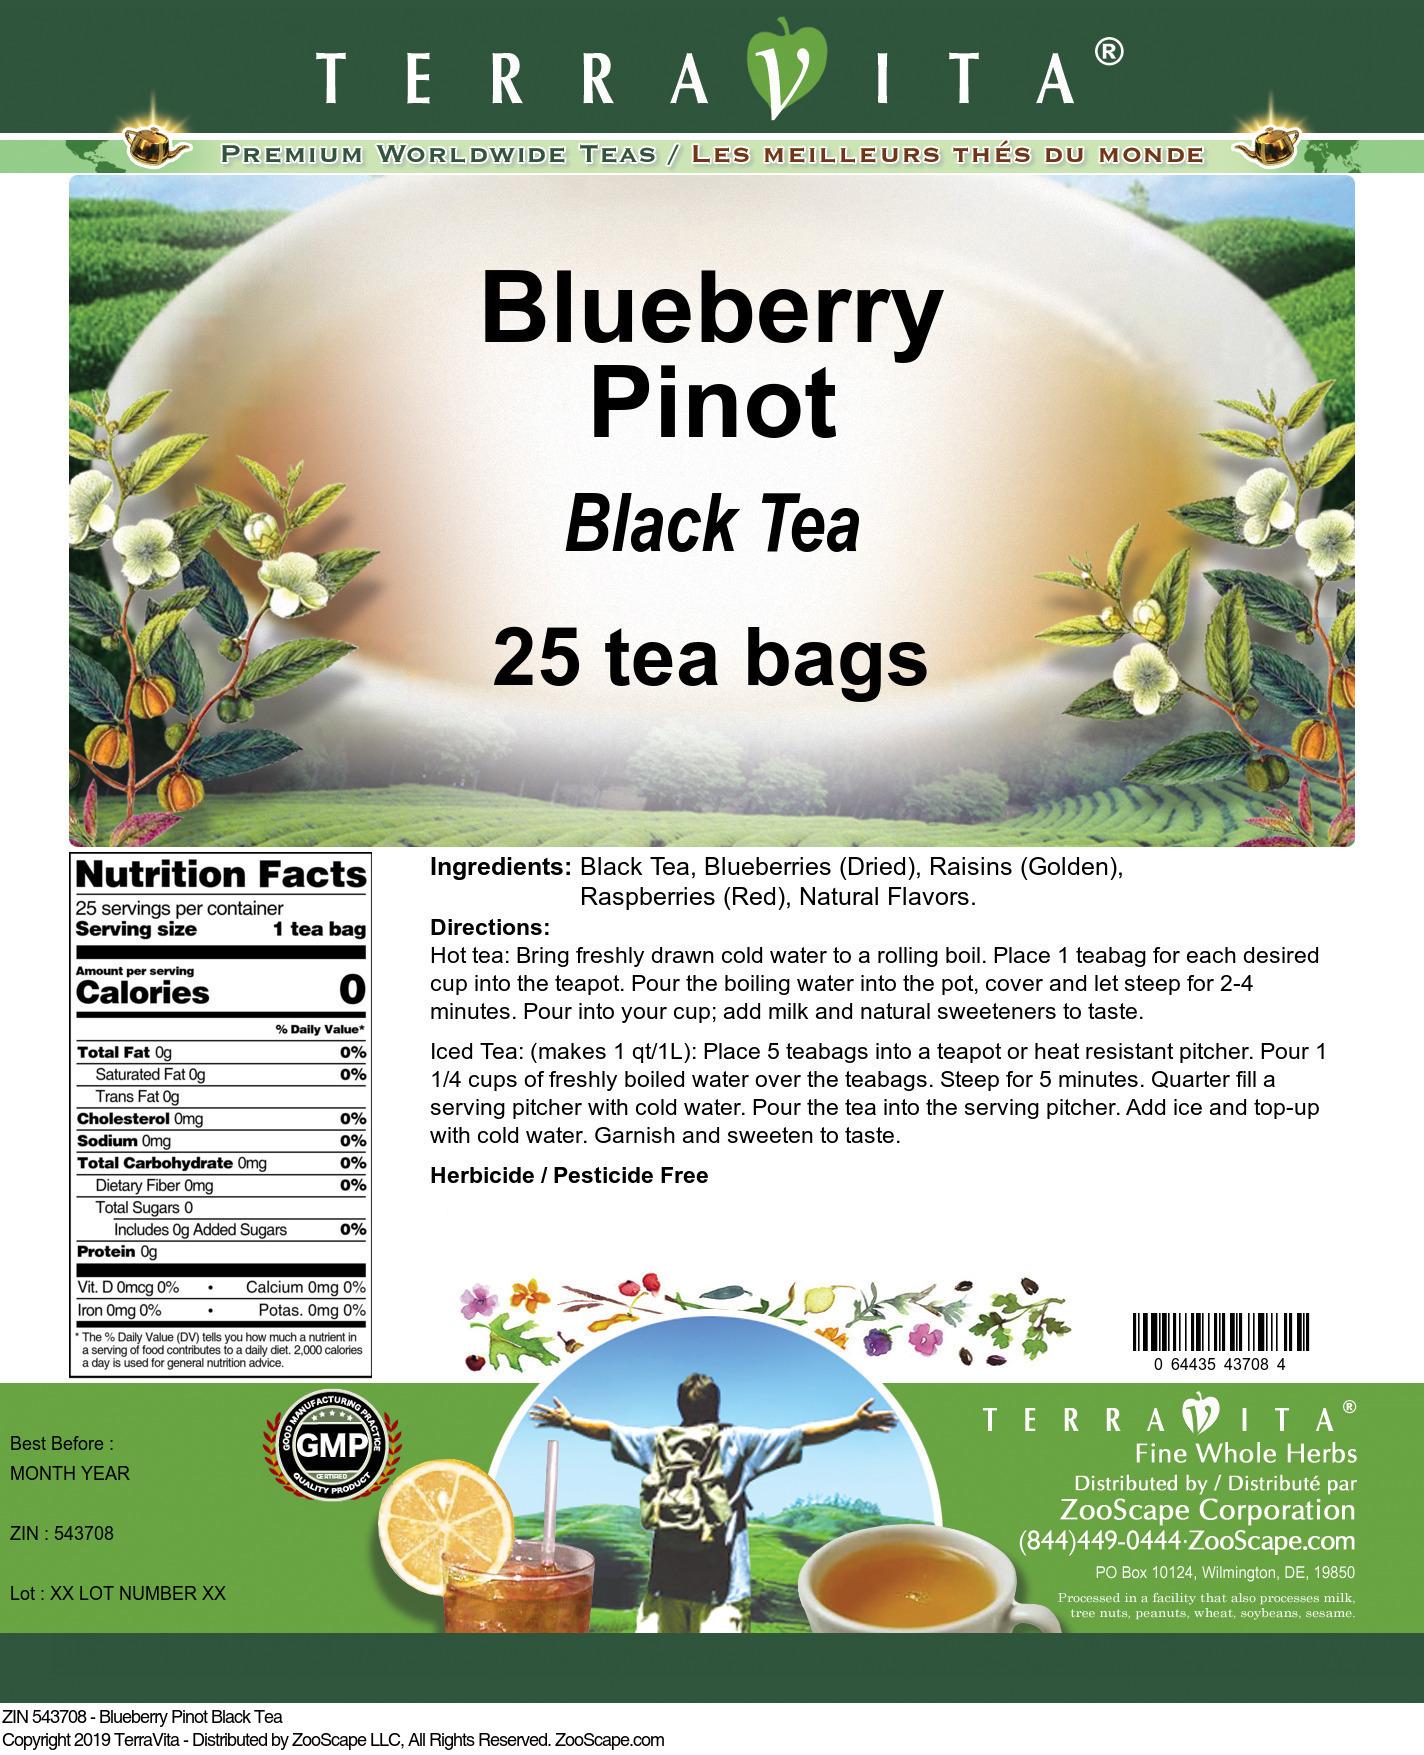 Blueberry Pinot Black Tea